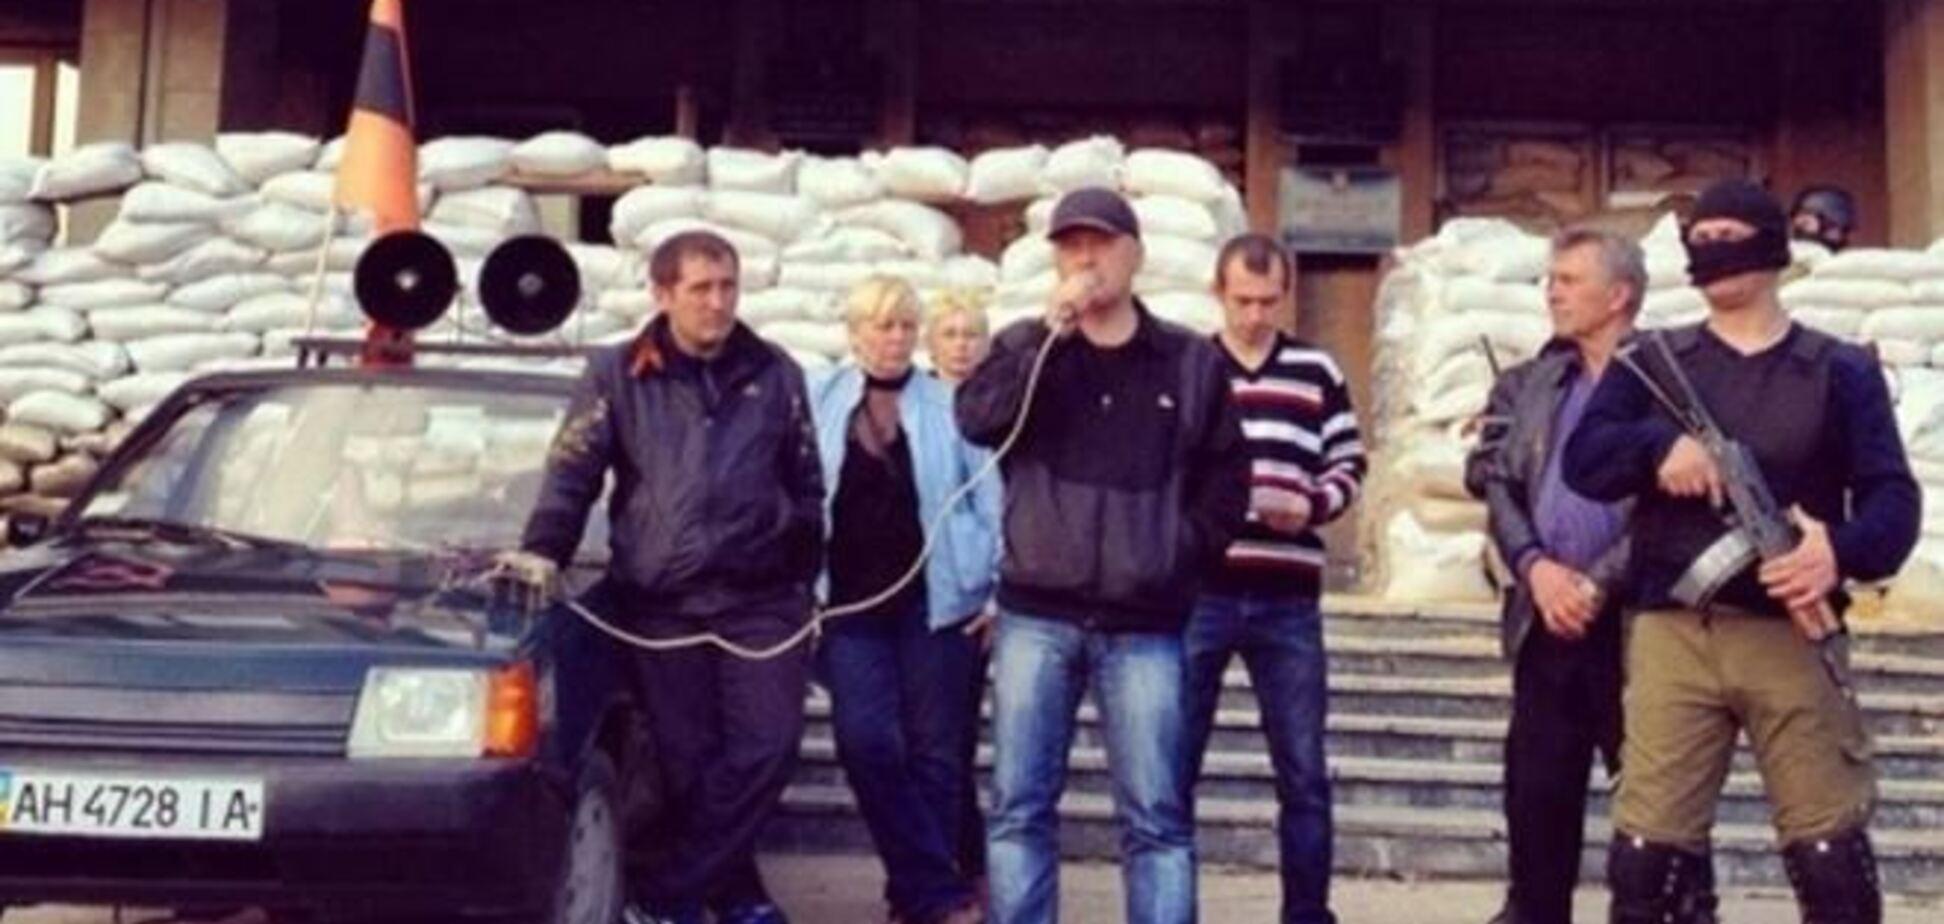 Сепаратисты в Славянске захватили мэра